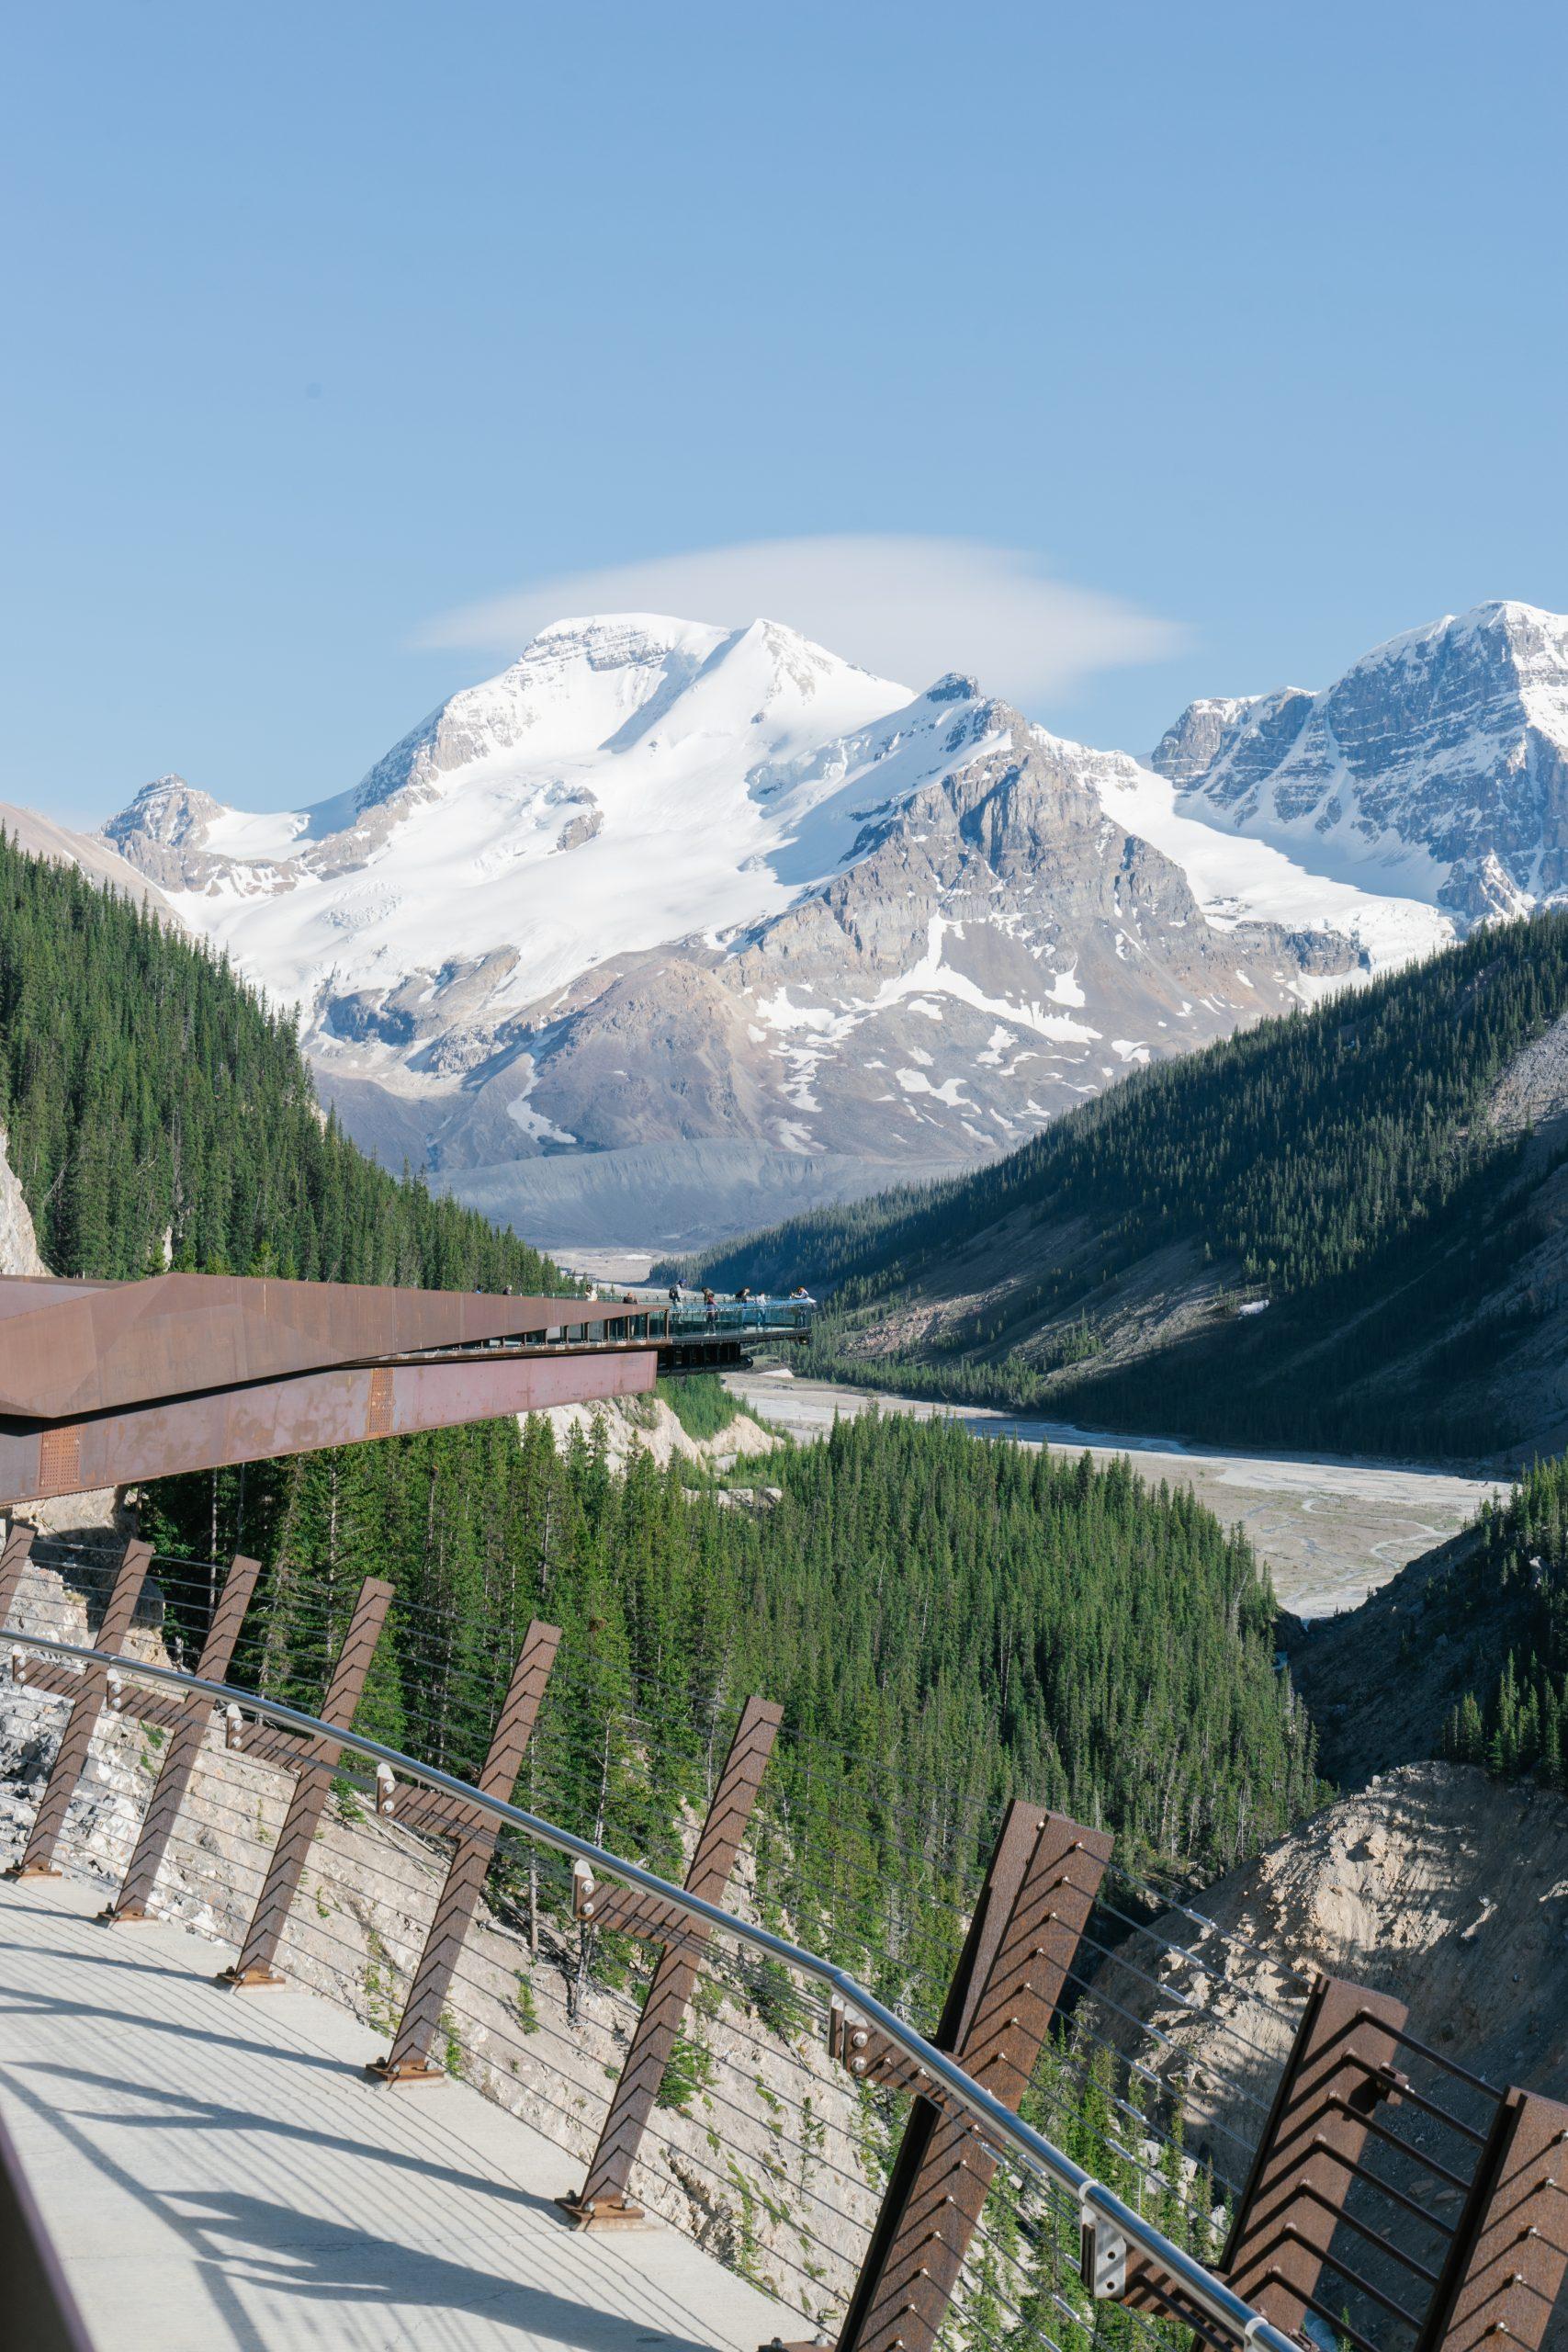 Glacier Skywalk, Columbia Icefield, Athabasca Glacier, Jasper National Park, Alberta